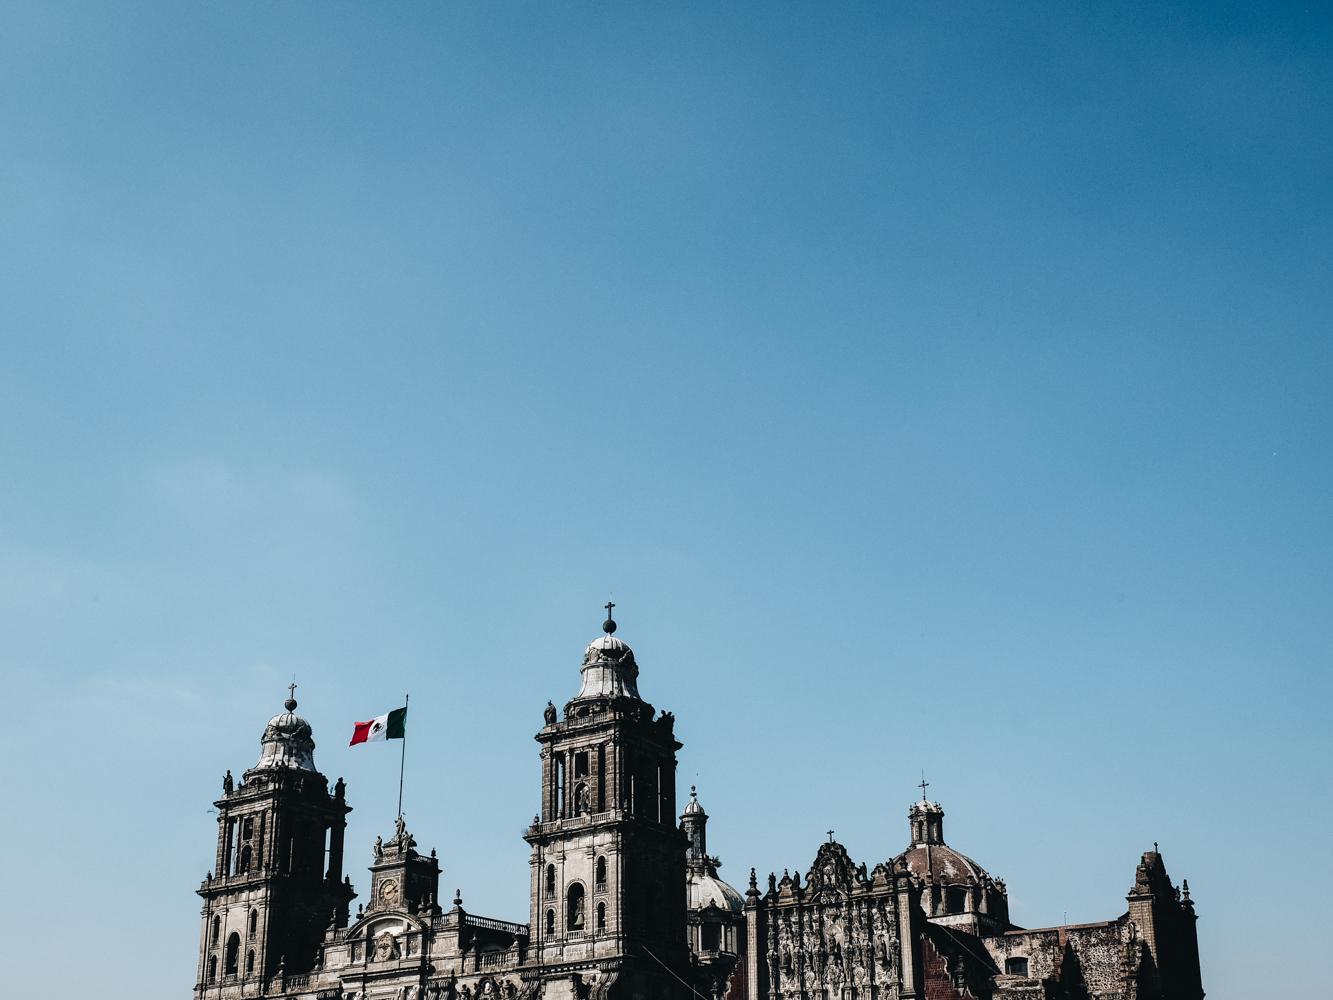 Cookwilltravel - Mexico City - November - DSCF4540.jpg